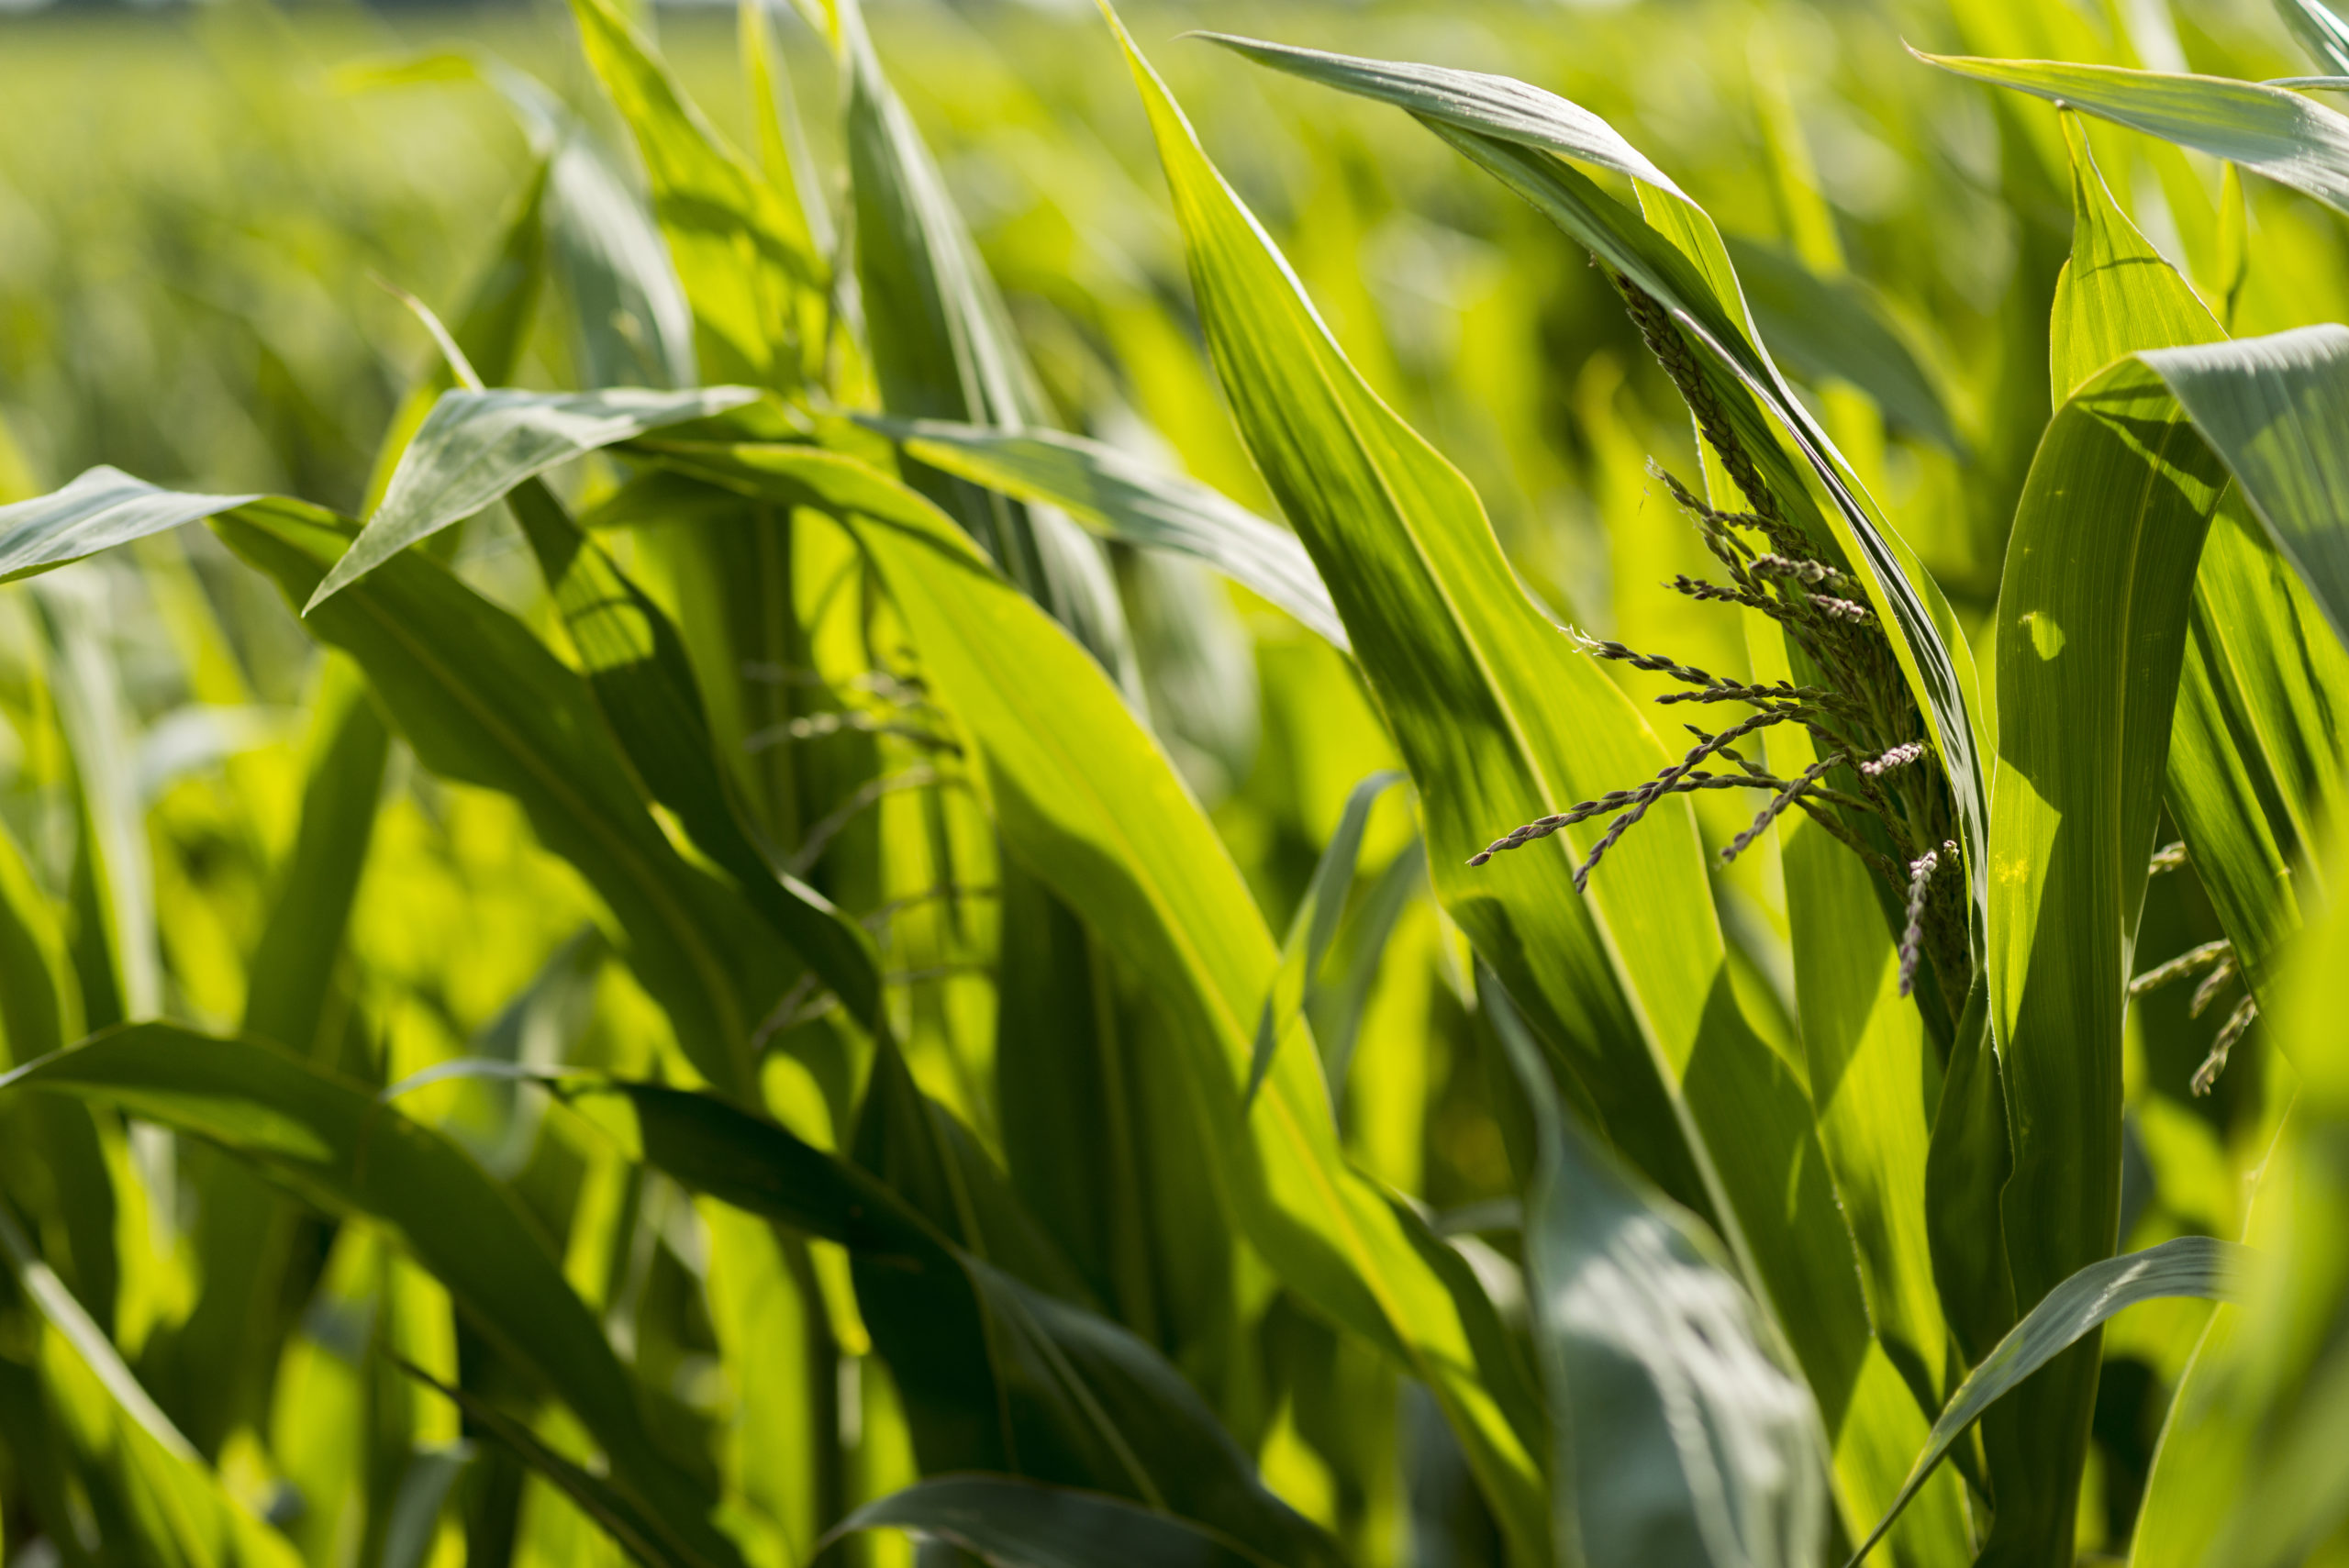 corn field поле кукуруза